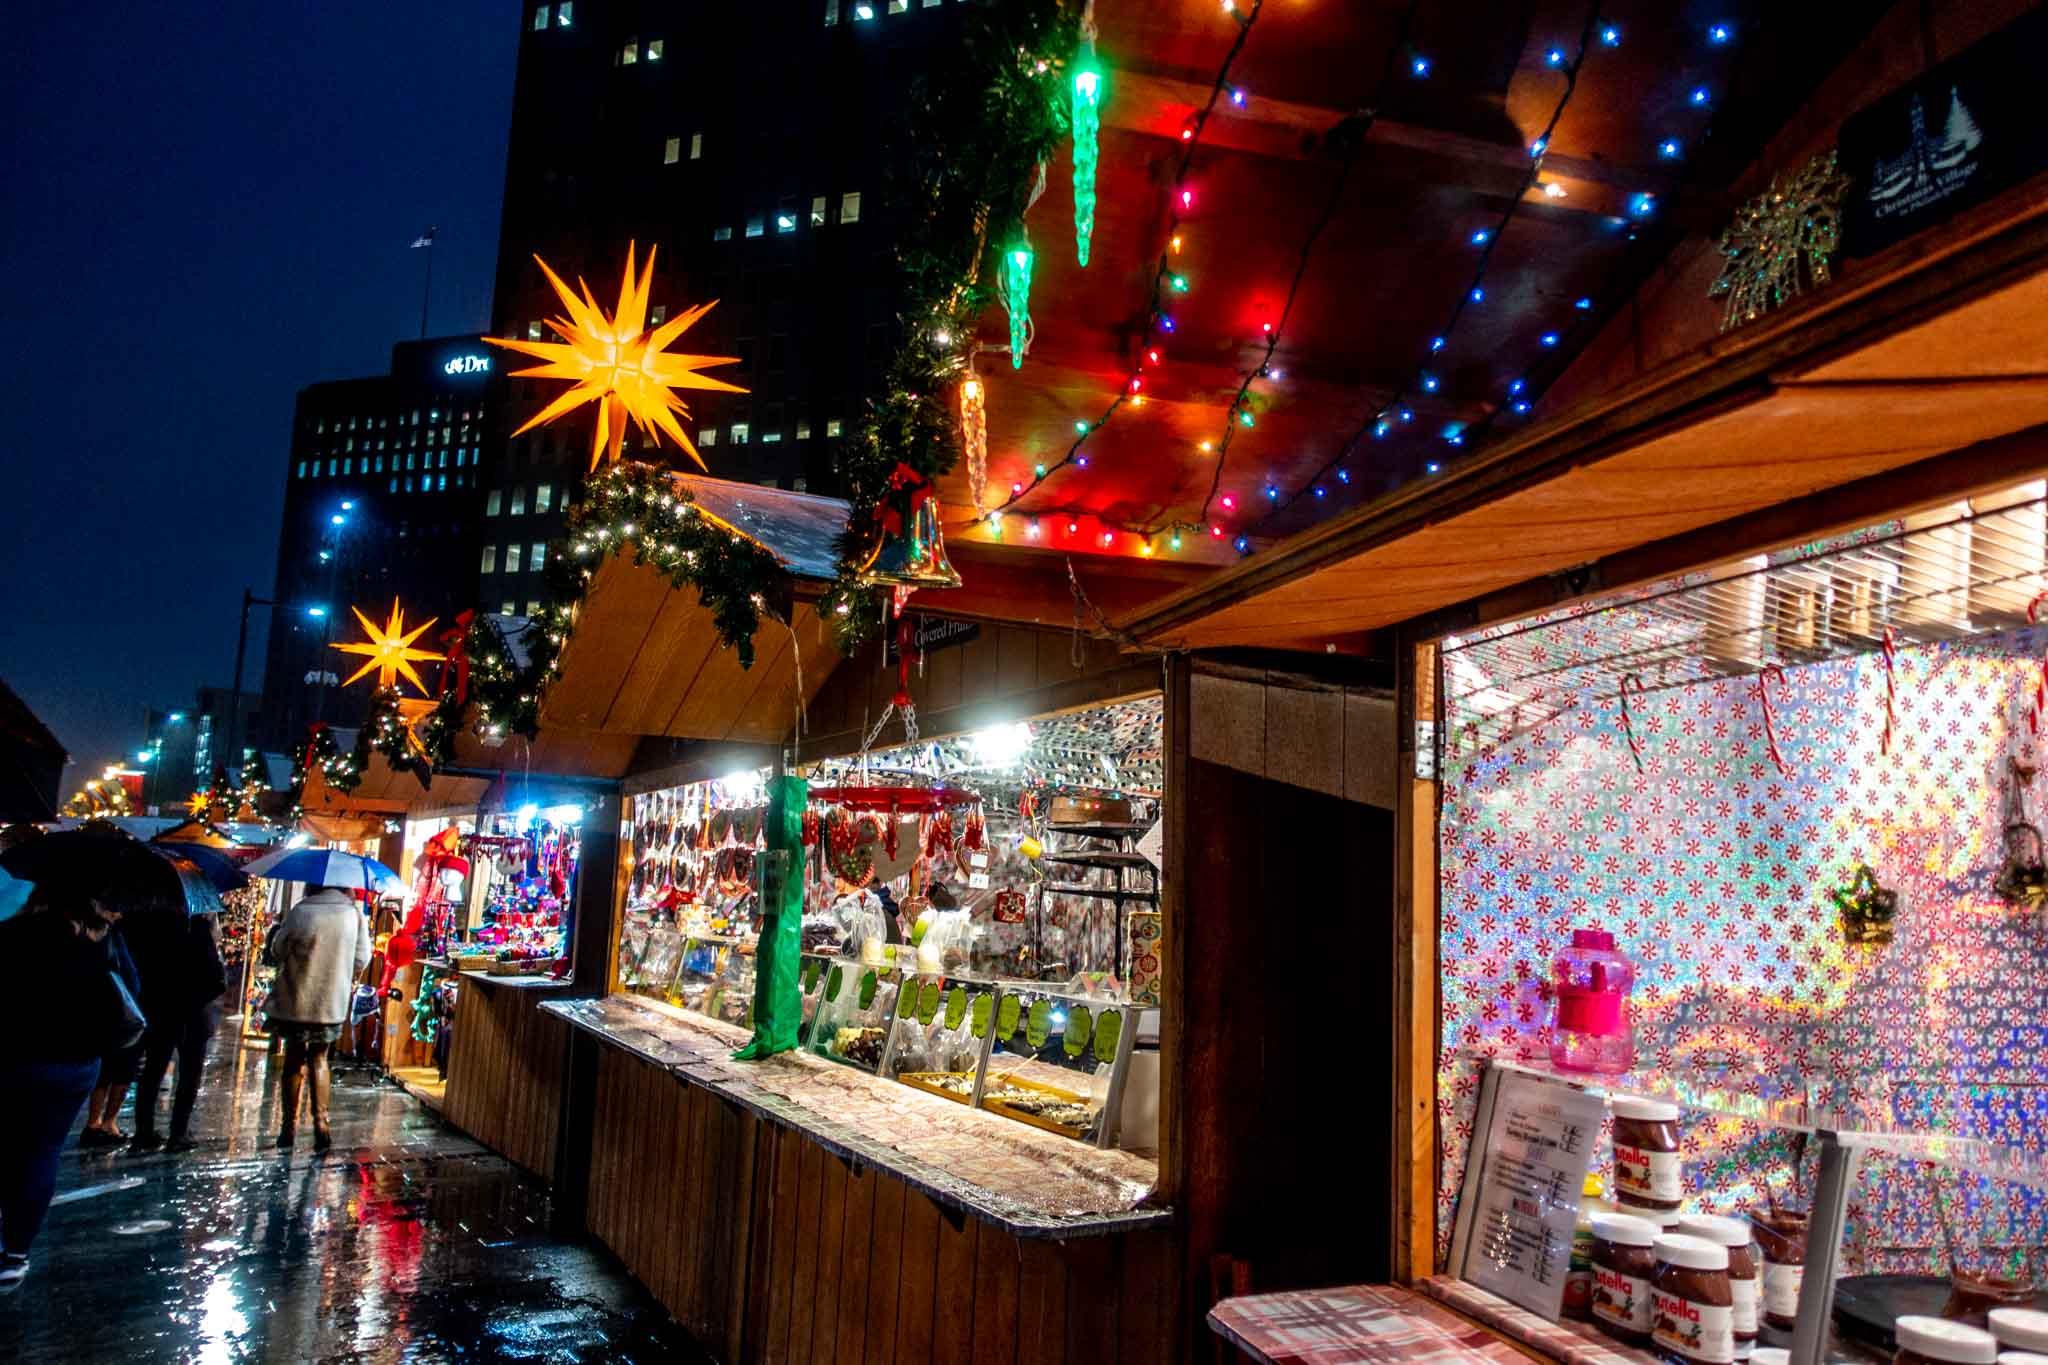 Wooden chalets housing Christmas market vendors